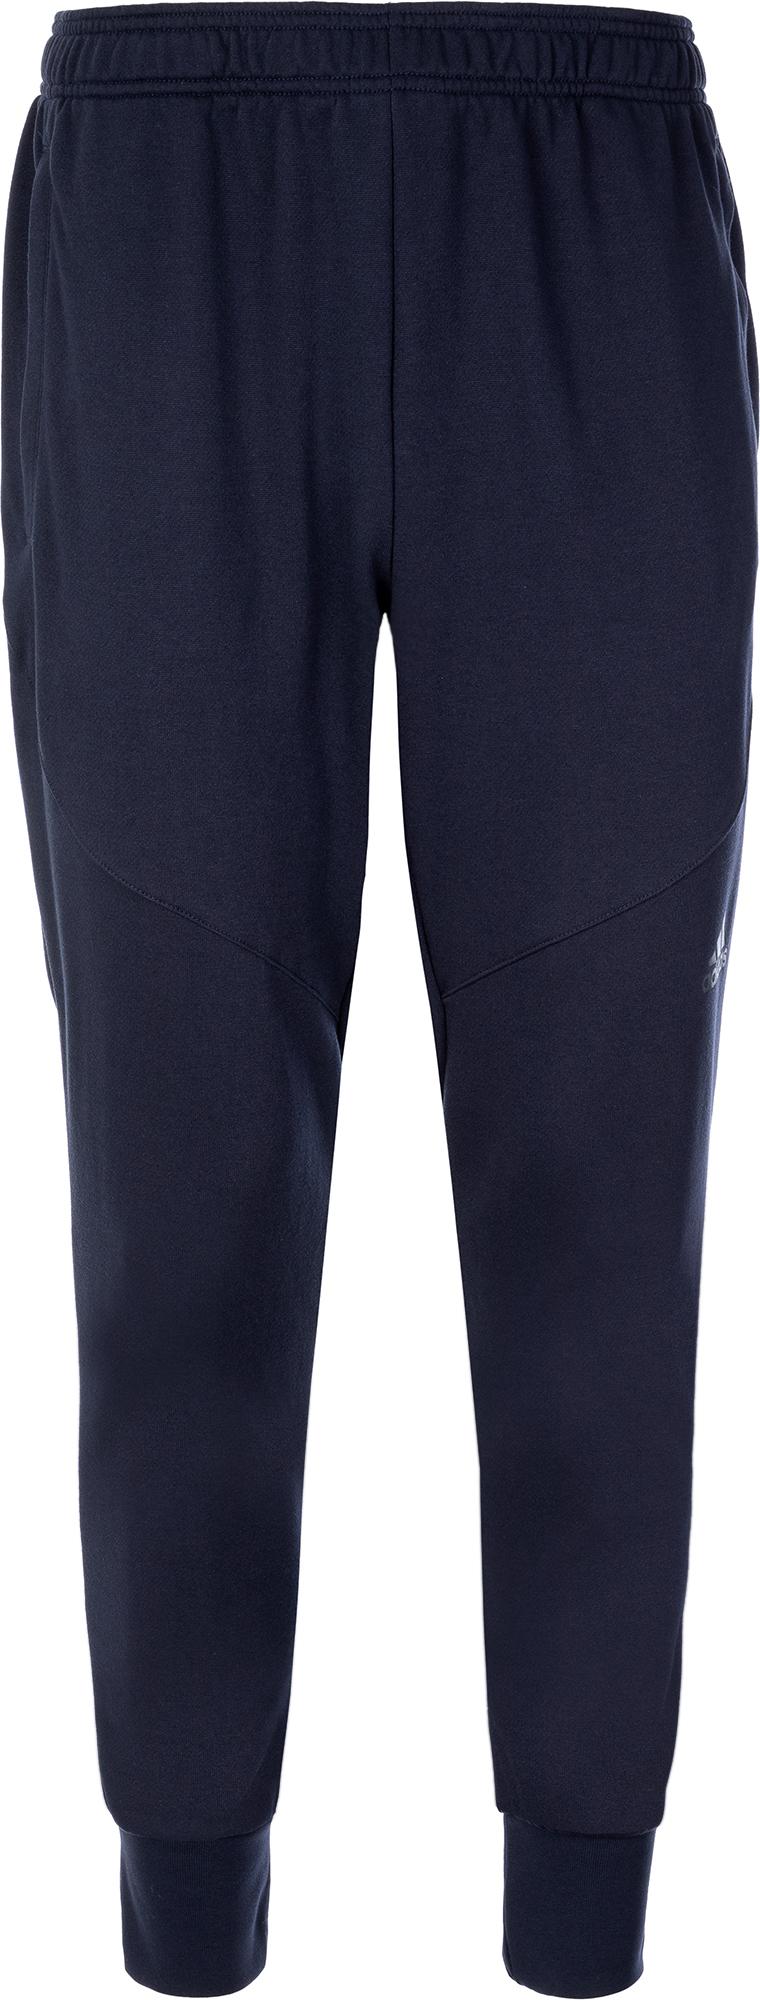 Adidas Брюки мужские Prime Workout, размер 58